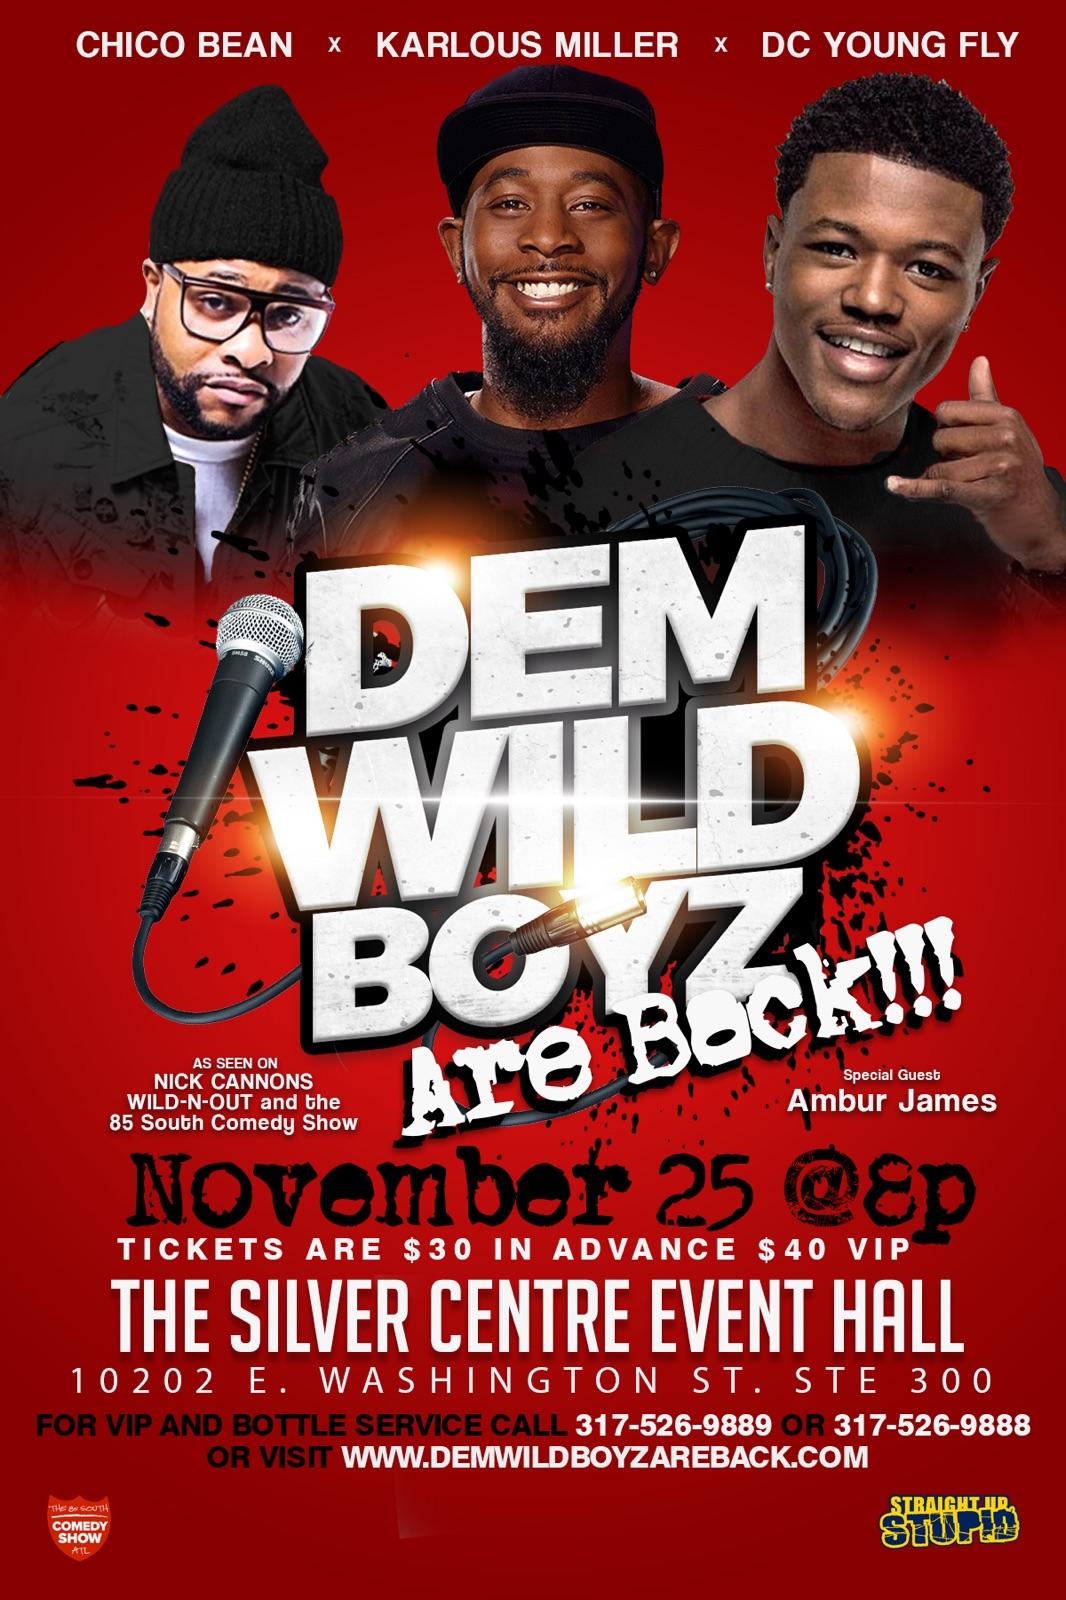 Dem Wild Boyz are Back